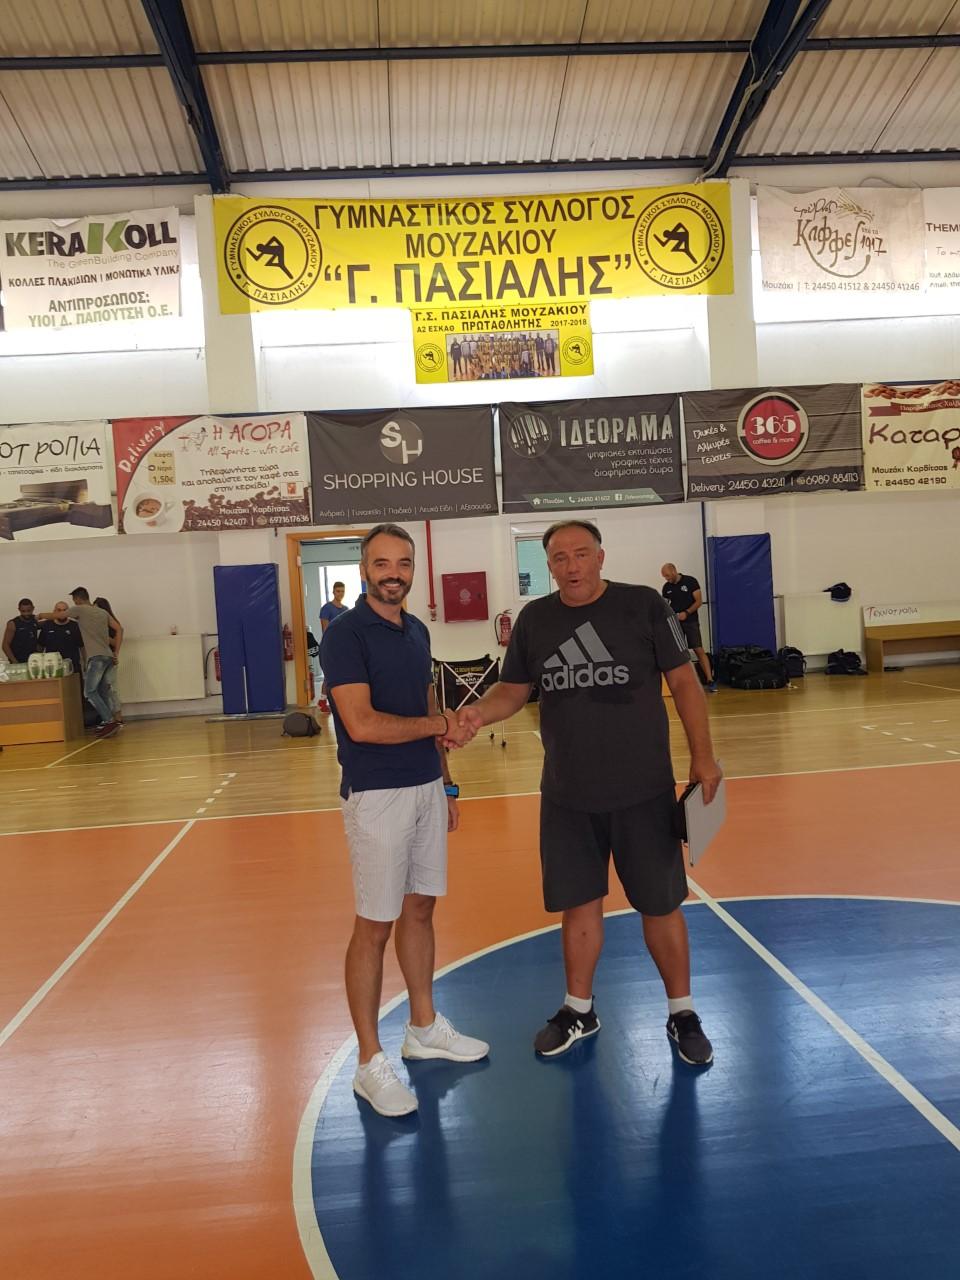 O Κοσμάς νέος προπονητής στον ΓΣ Μουζακίου